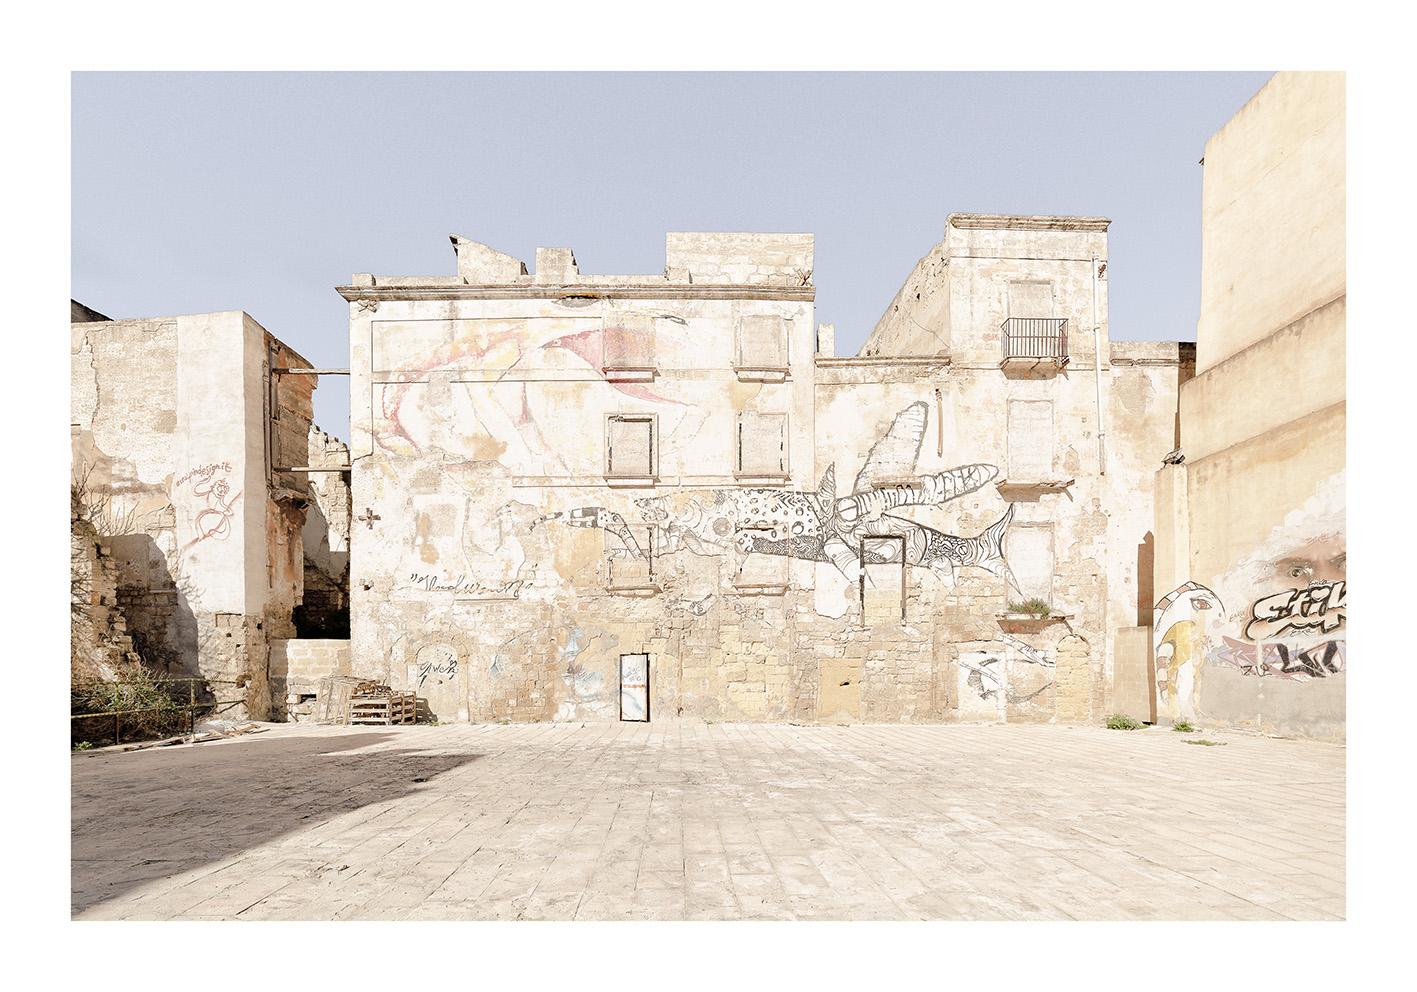 Franco-Sortini-Un-luogo-neutro-livin_art-fotografia8